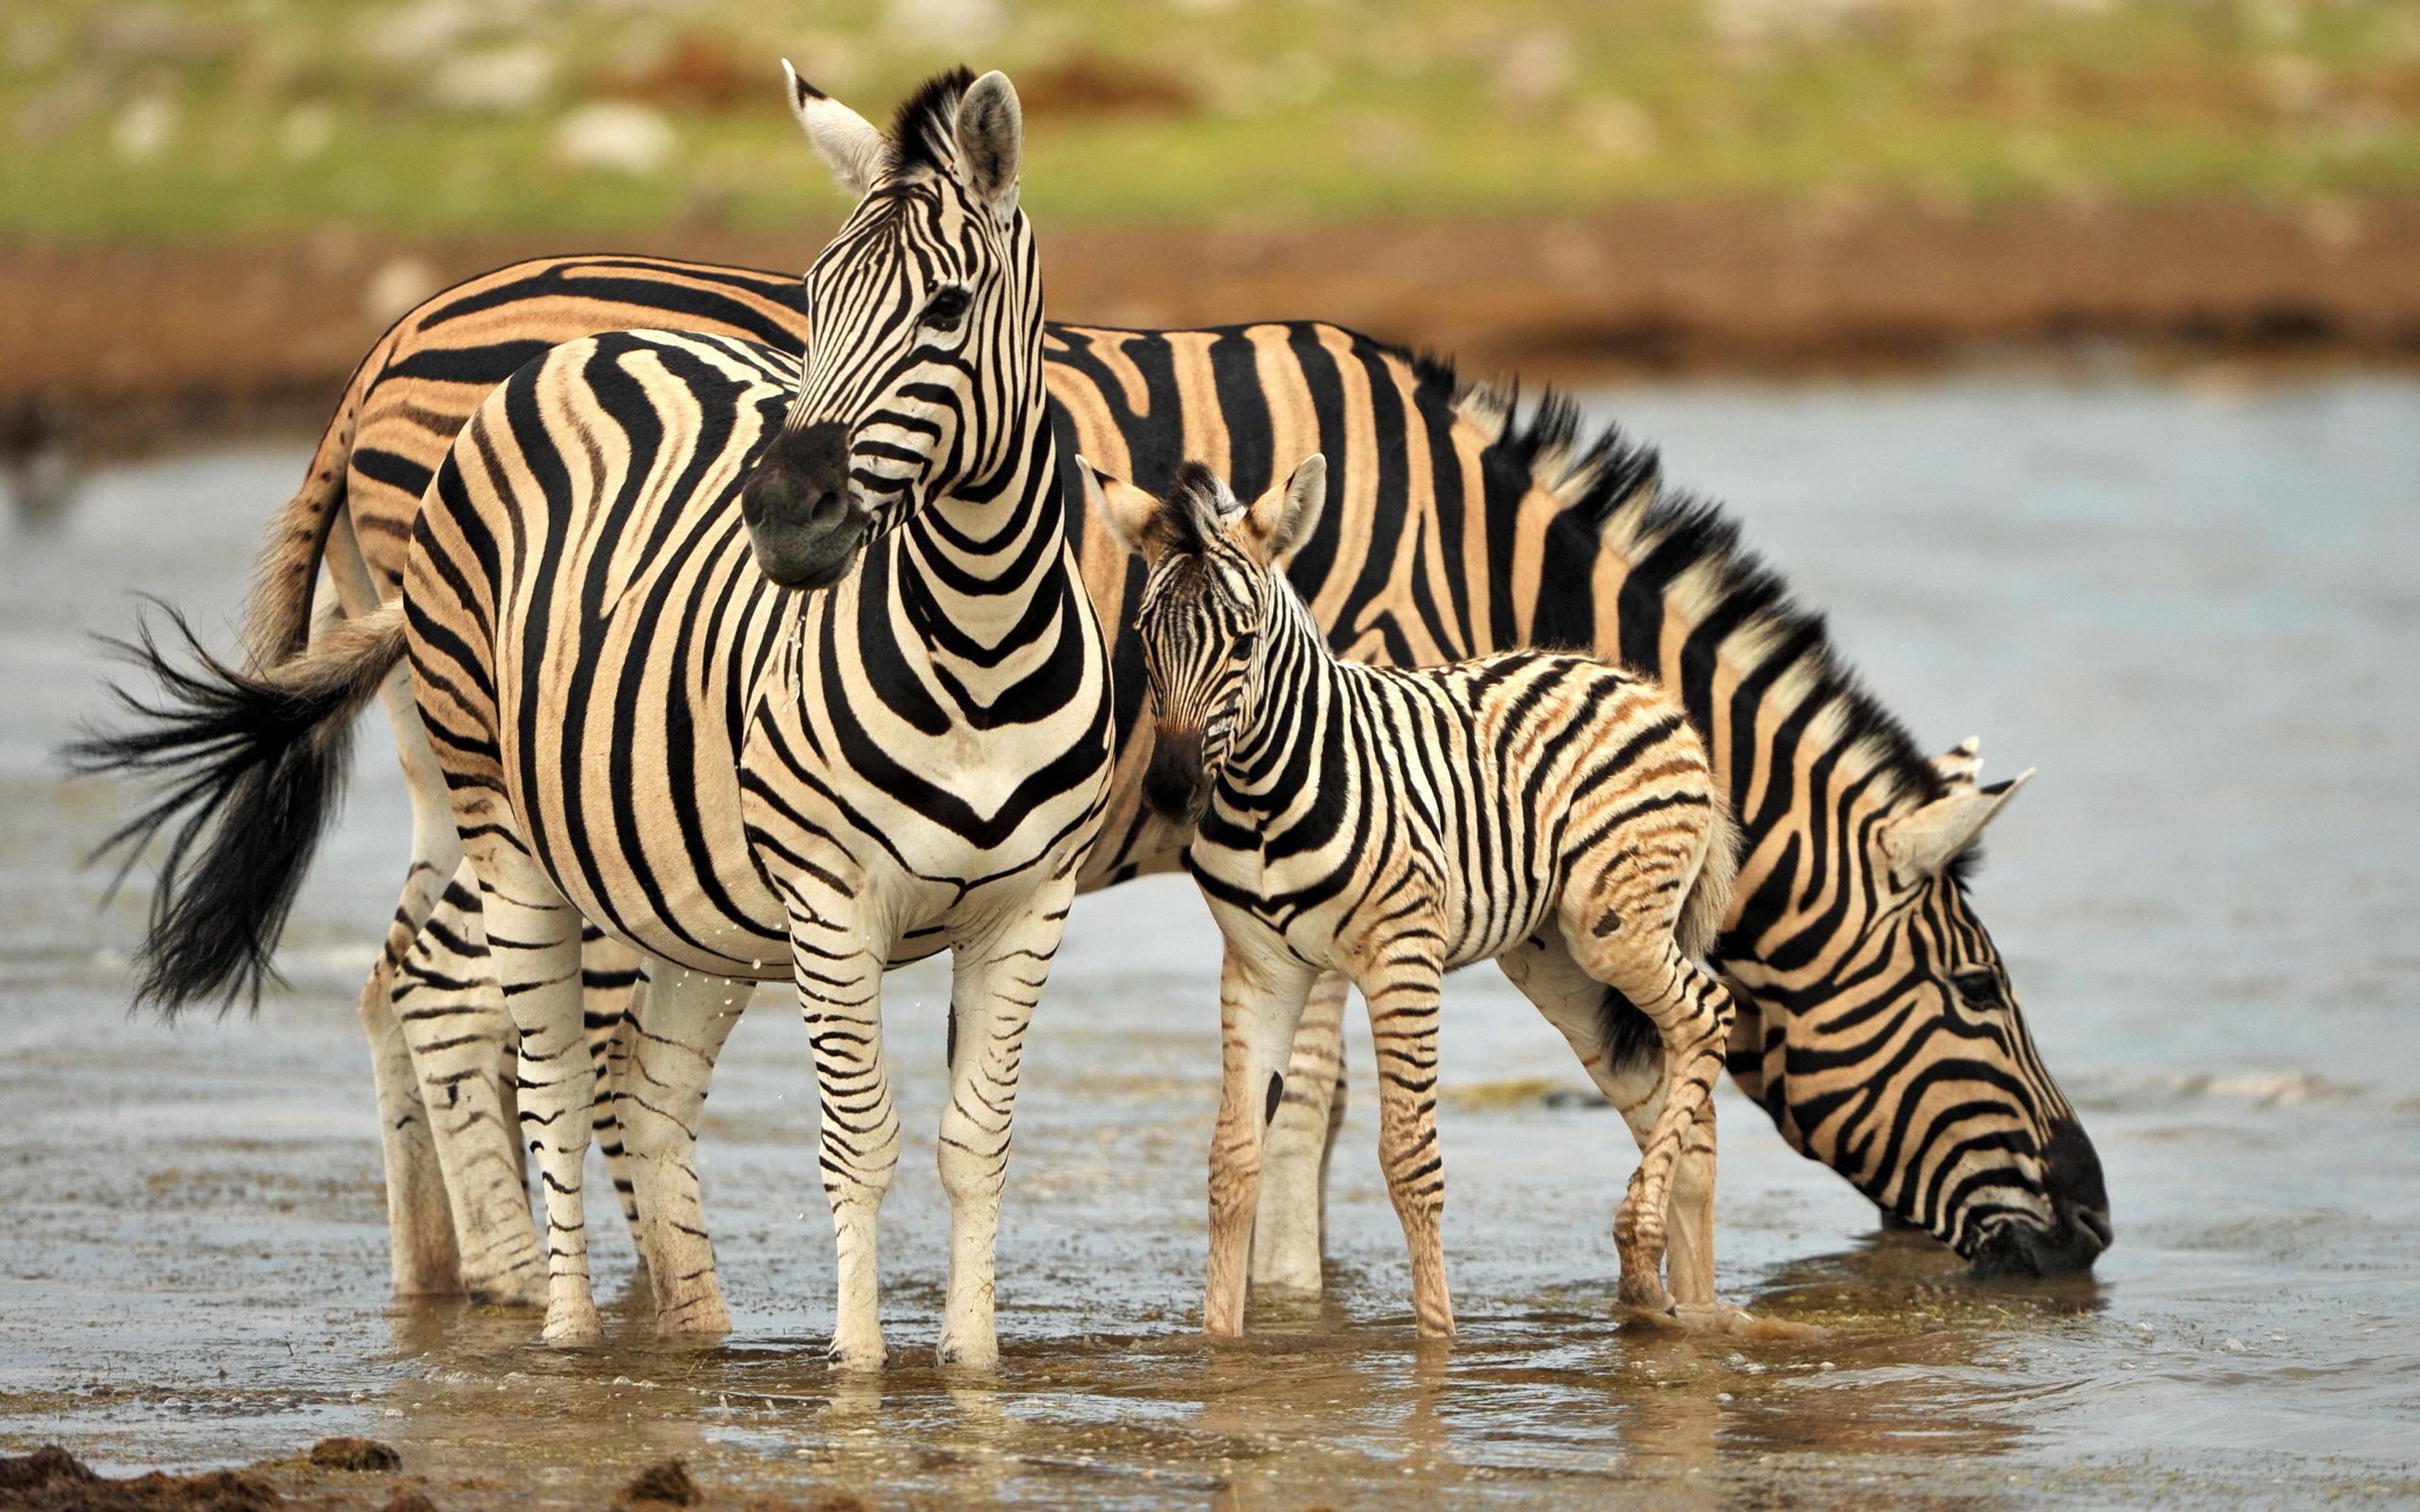 Cute Animal Christmas Wallpaper Zebra Family Drinking Water Wallpaper Hd Wallpapers13 Com